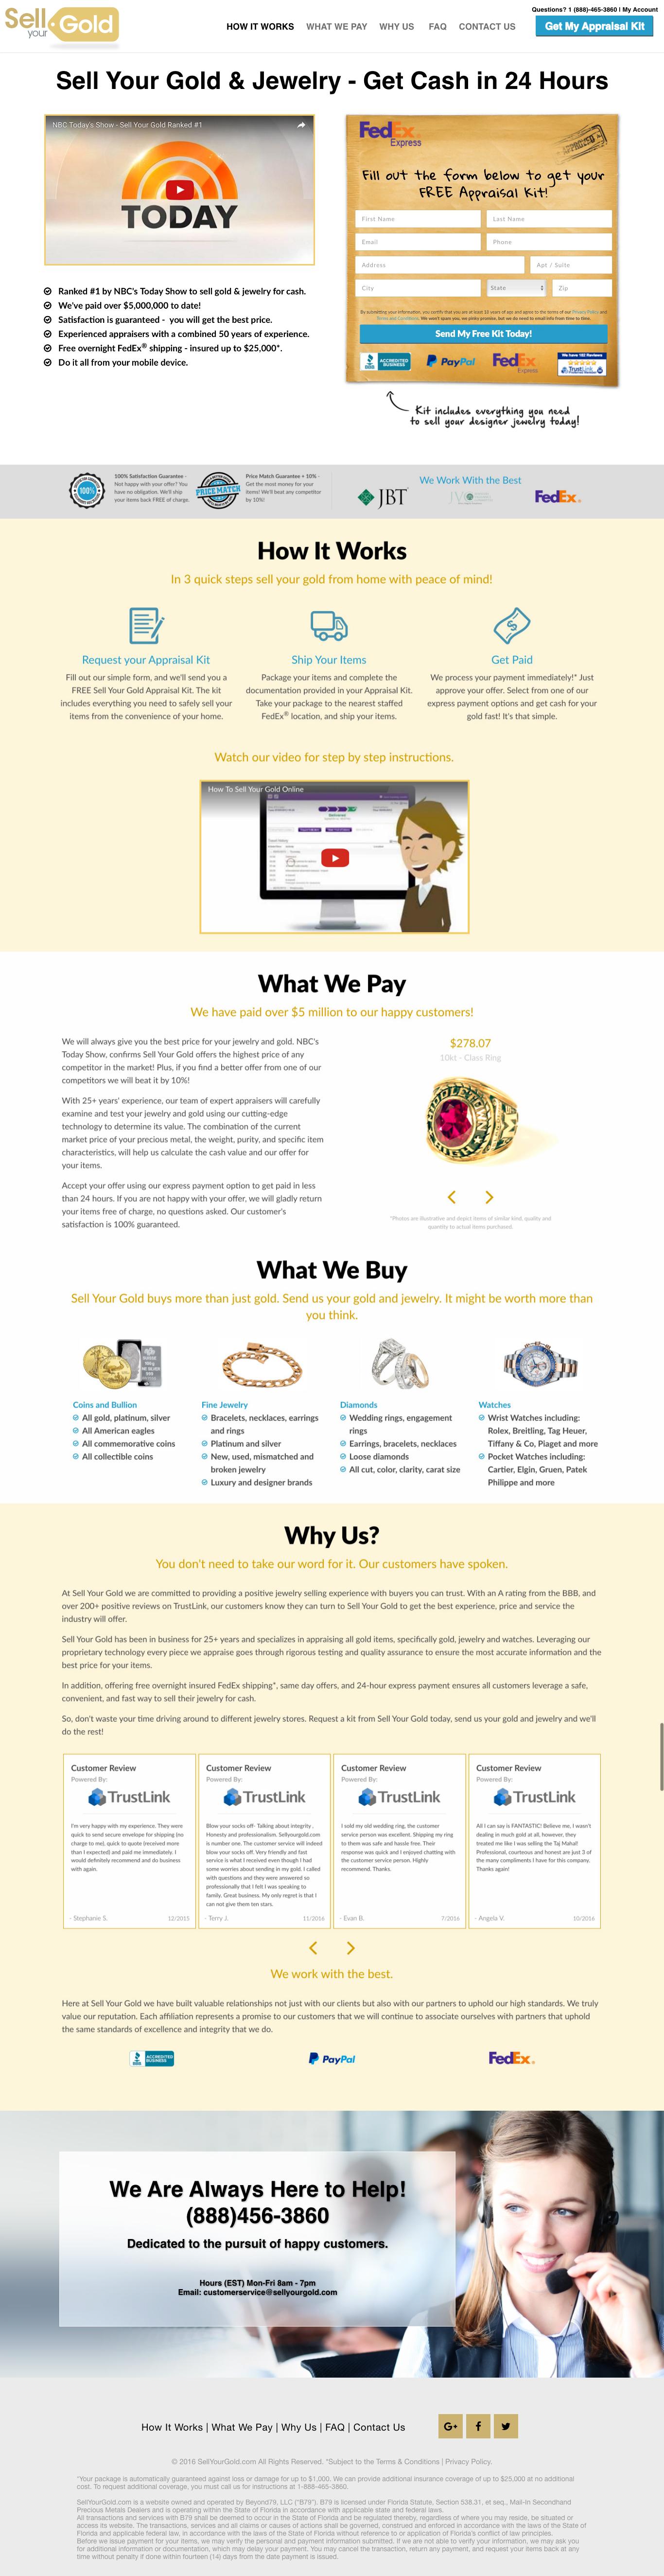 kunalamin.com SYG home-page concept